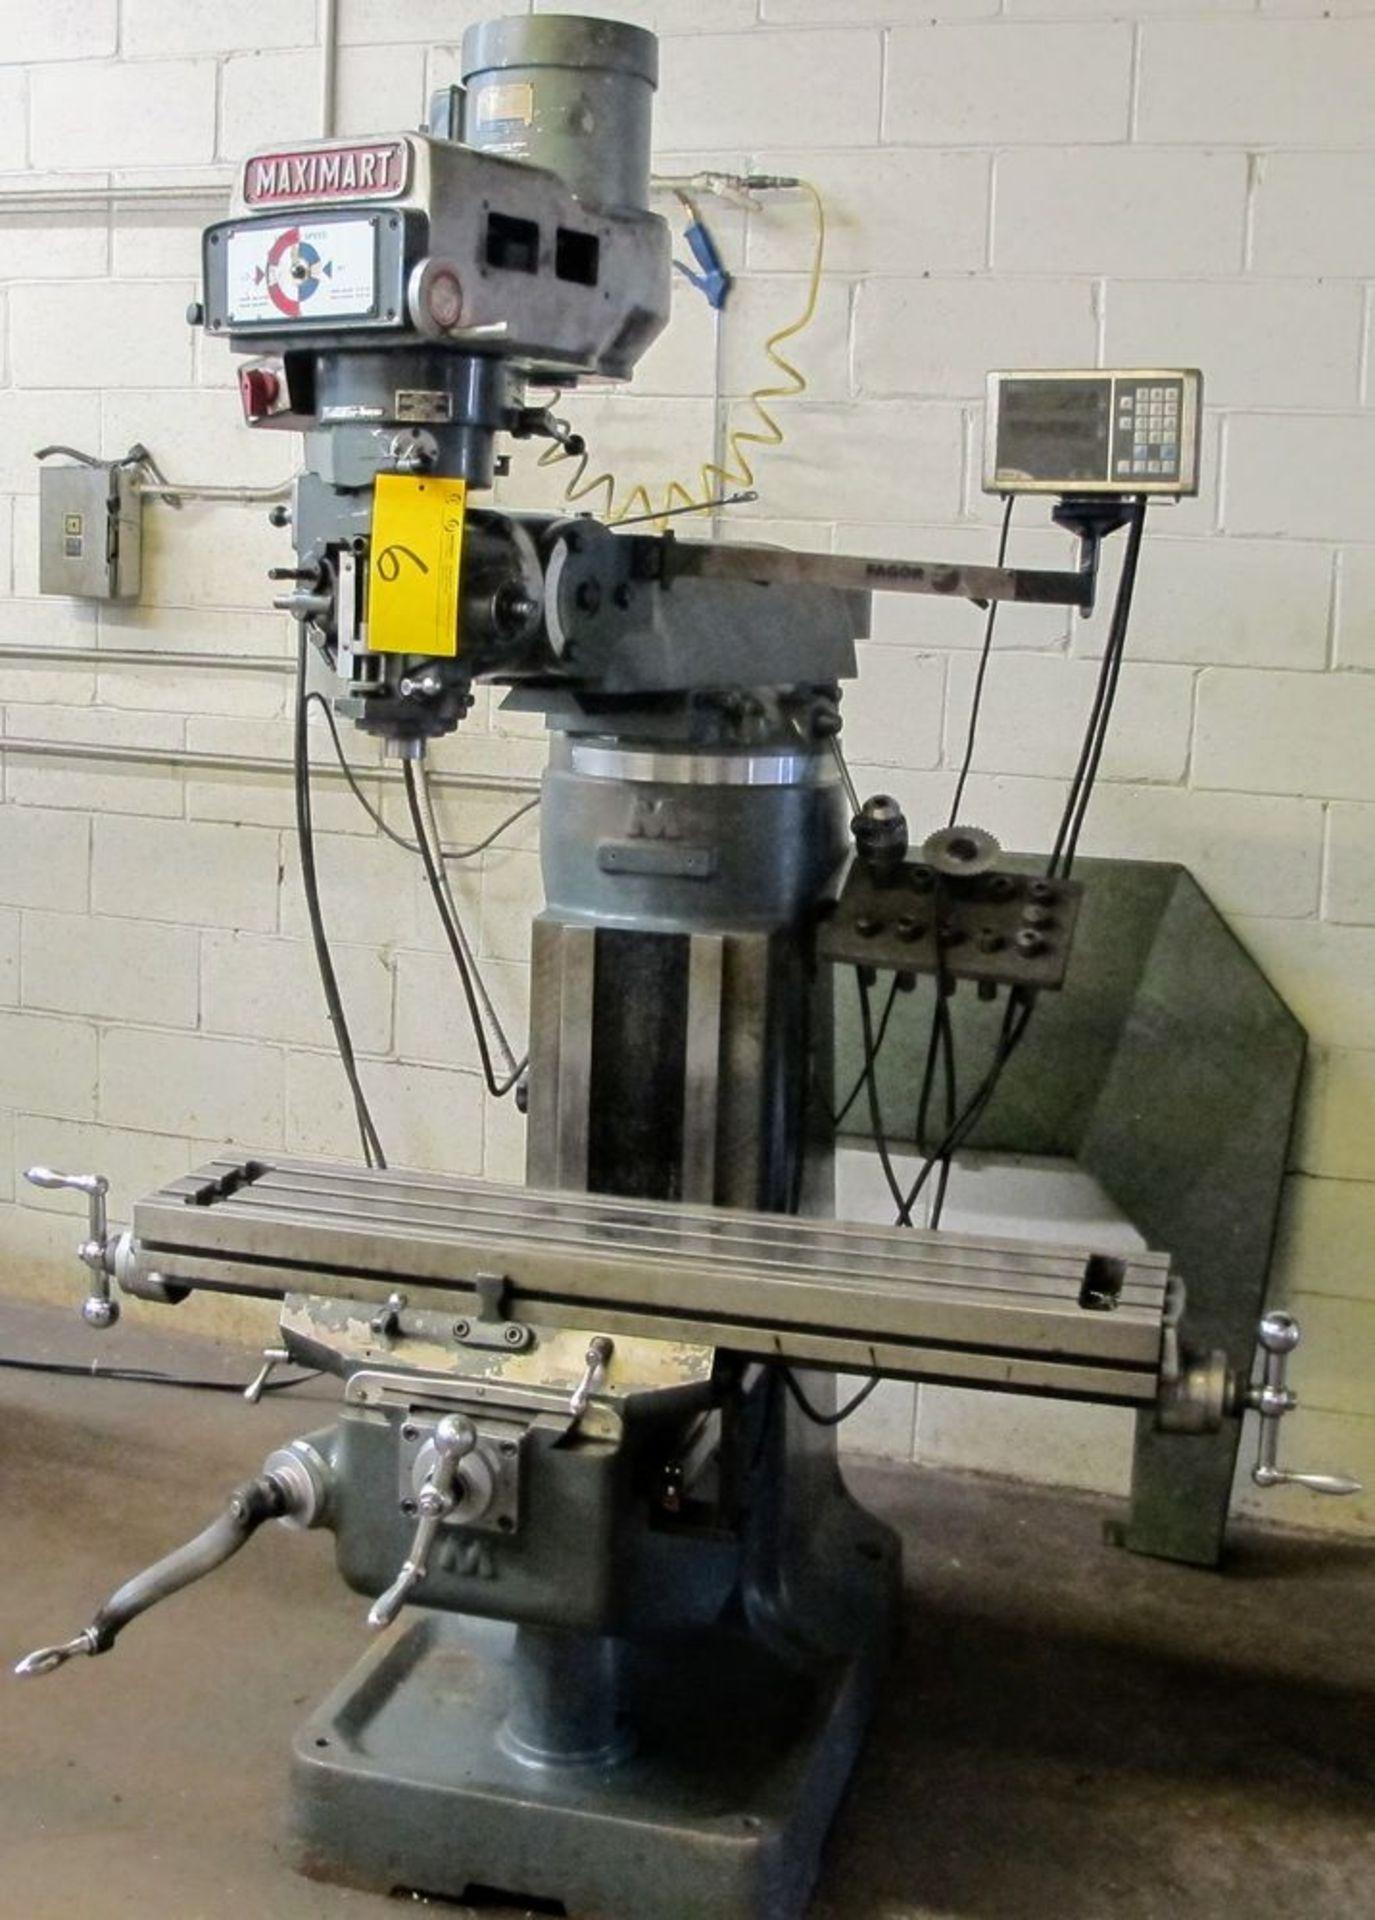 MAXIMART 1-1/2 VS VERTICAL MILLING MACHINE, 455-4300 RPM, S/N 95388, FAGOR 2 AXIS DRO, COLLET SET